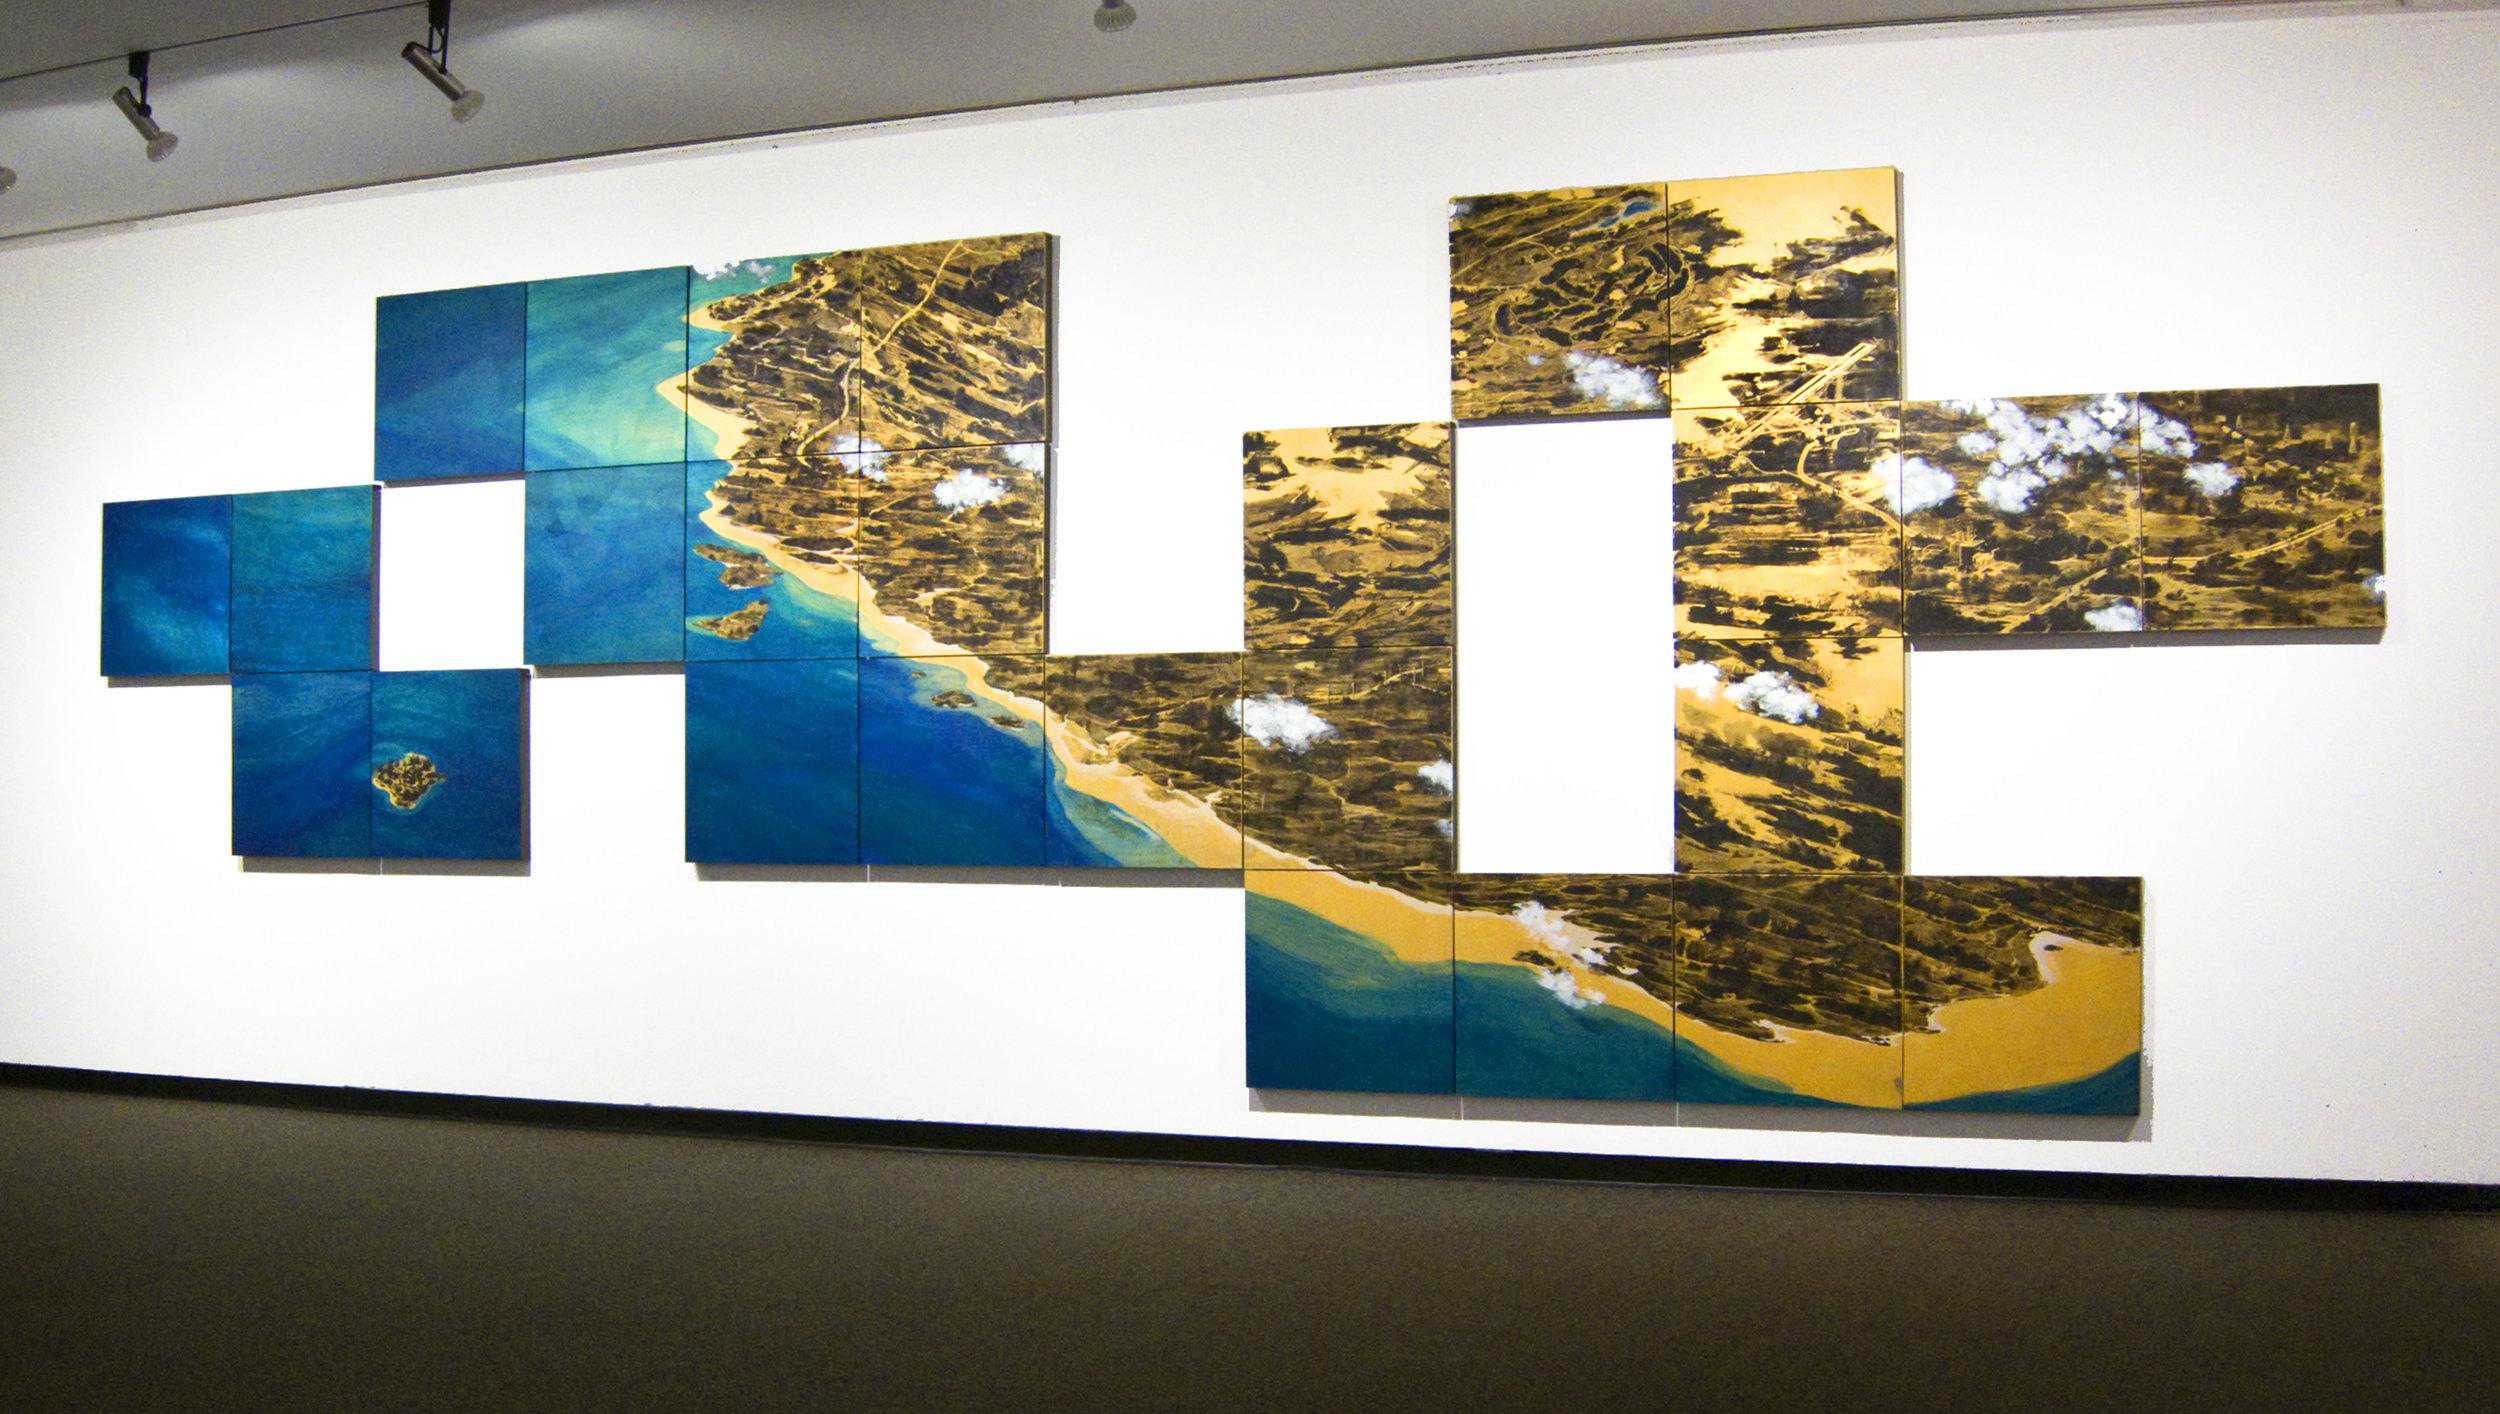 COAST, 8 ft. x 24 ft., 26 panels